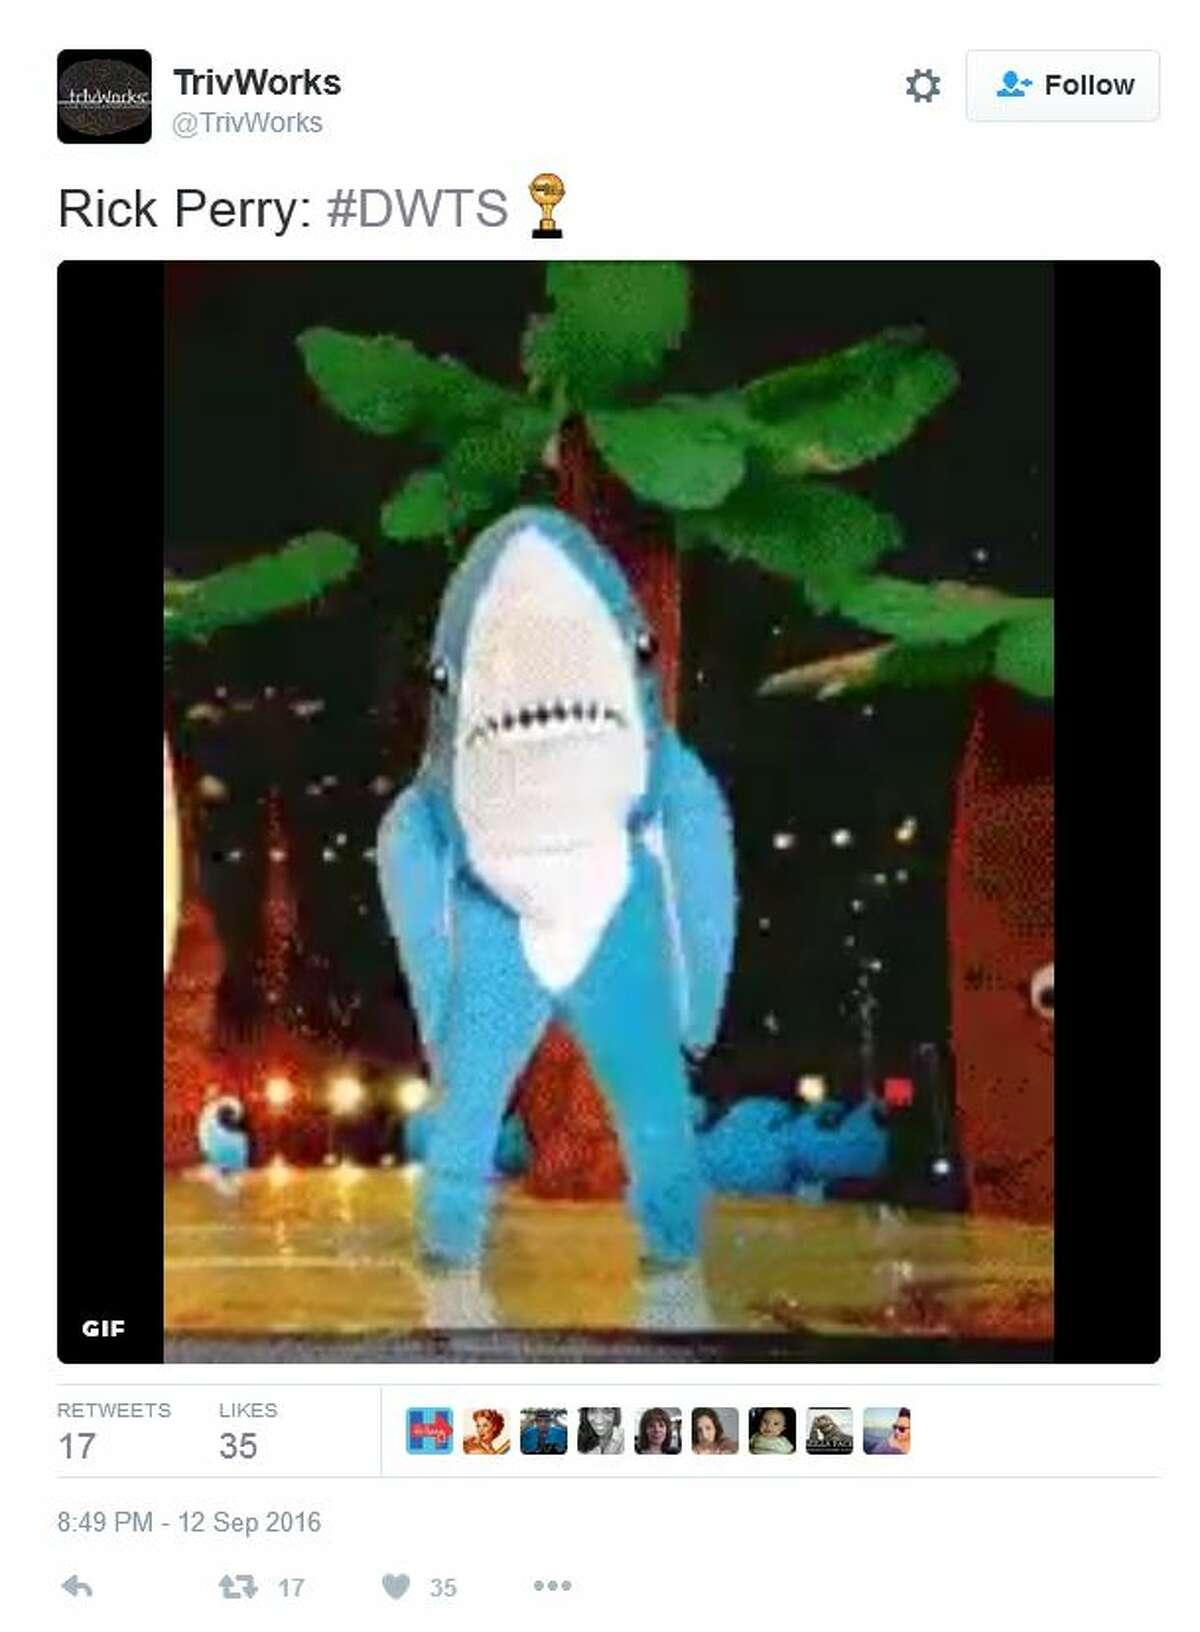 @TrivWorks Rick Perry: #DWTS